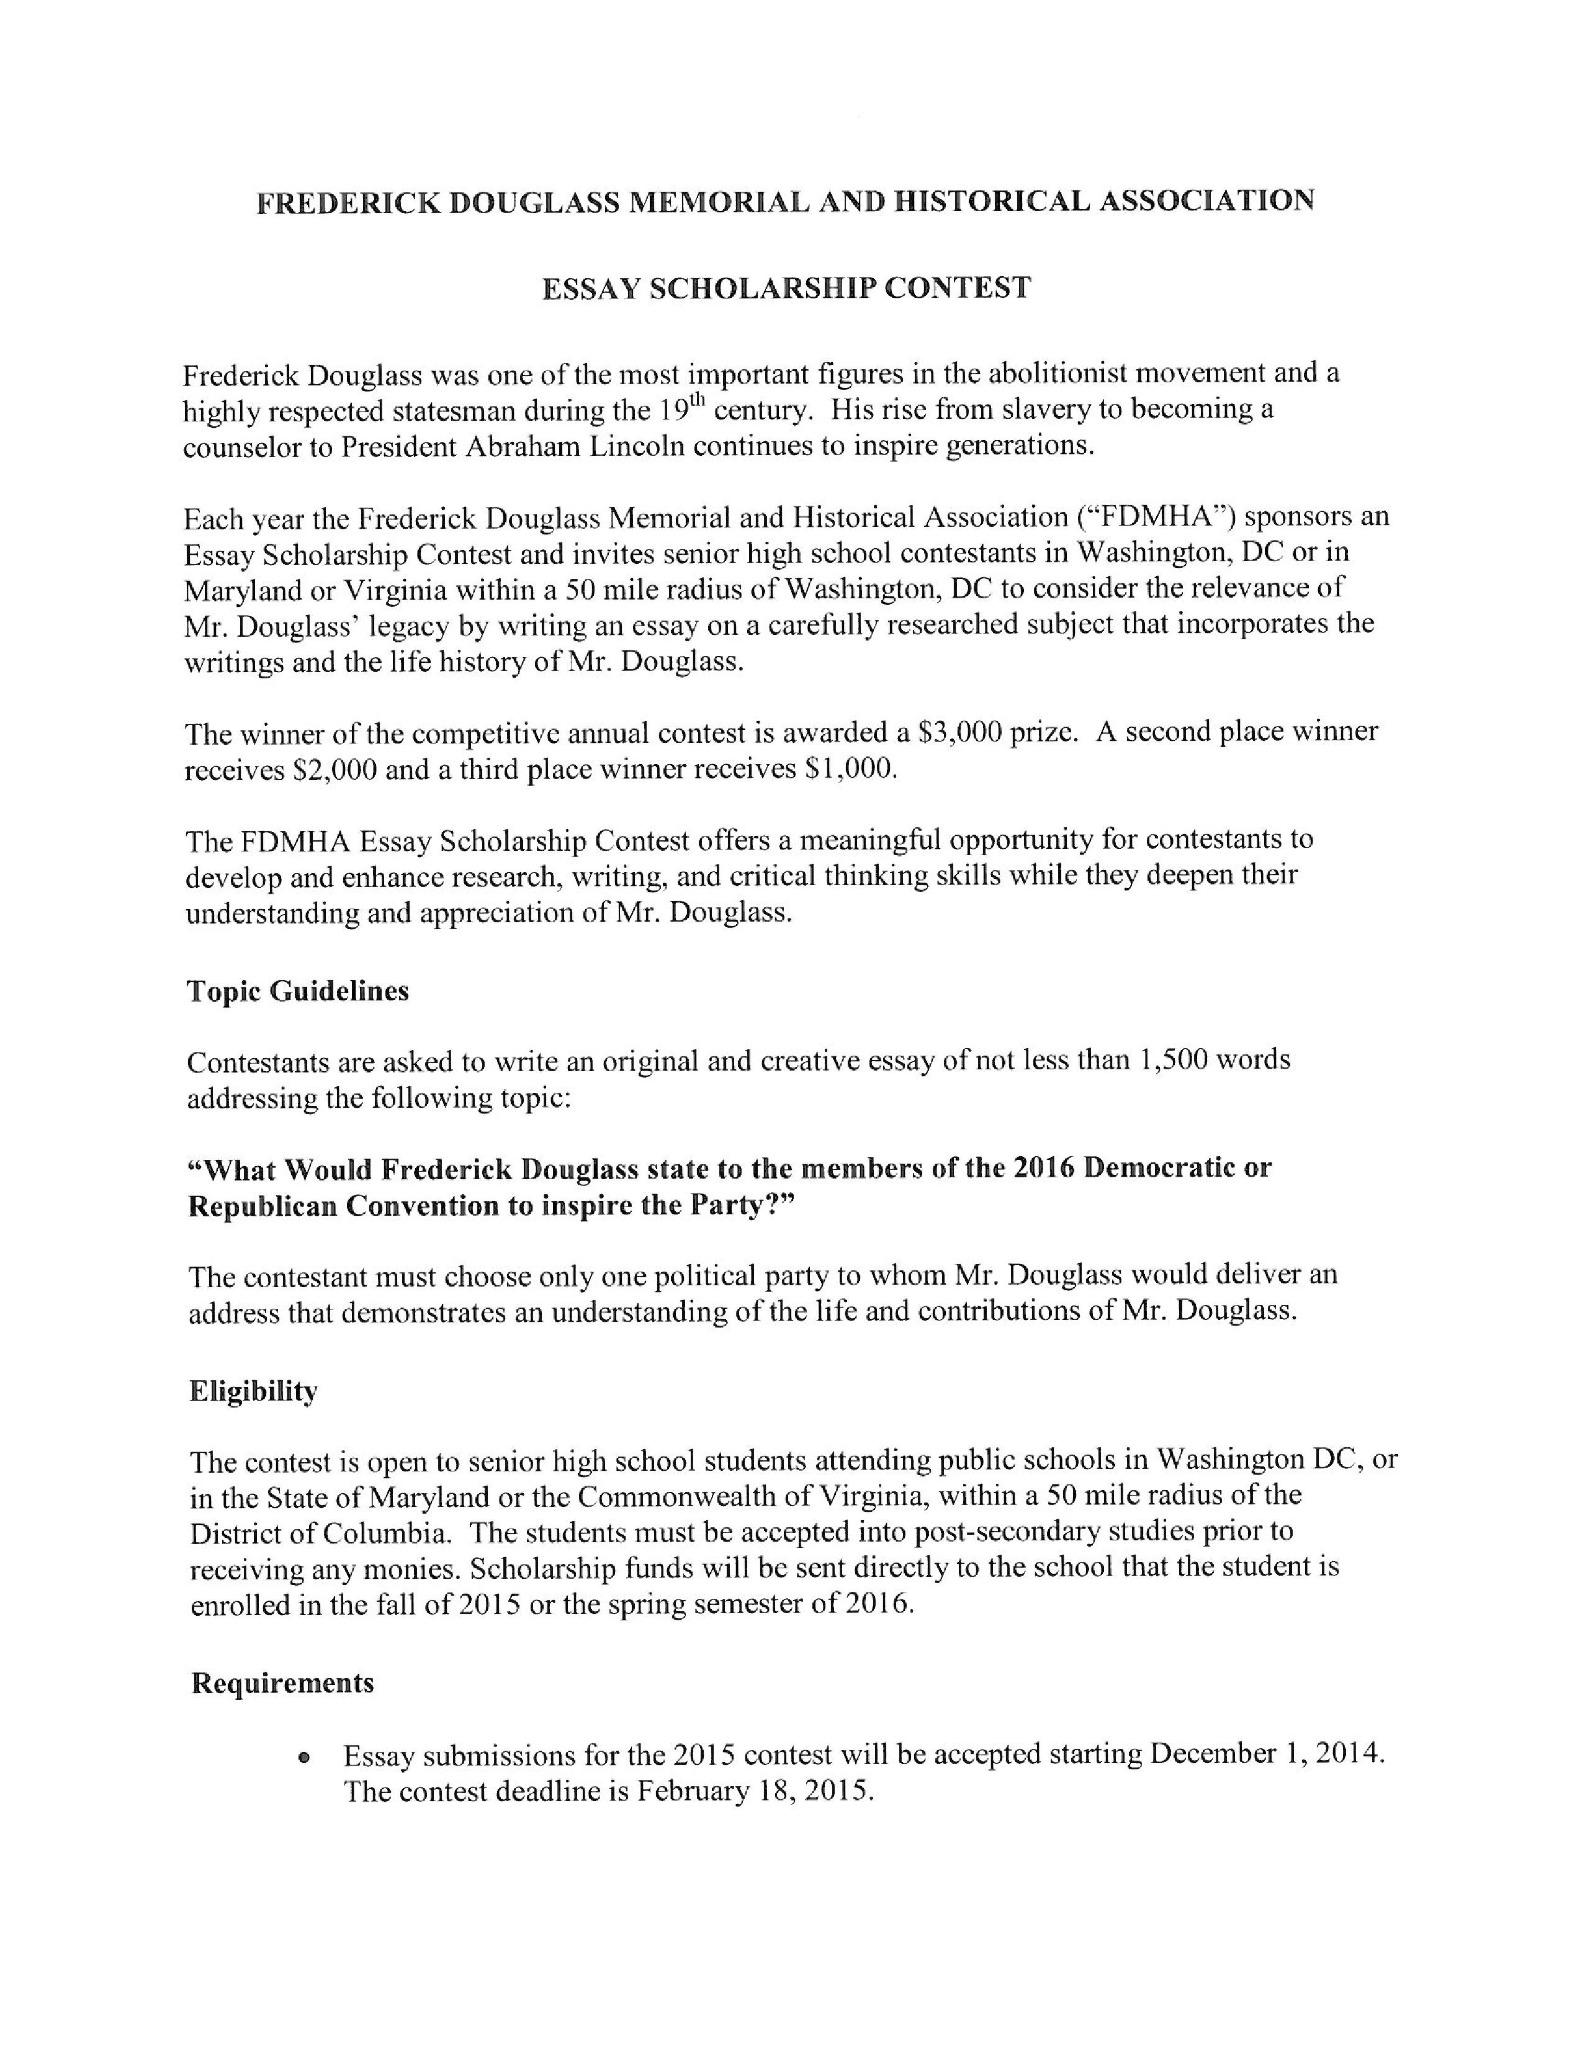 Christmas carol essay answers